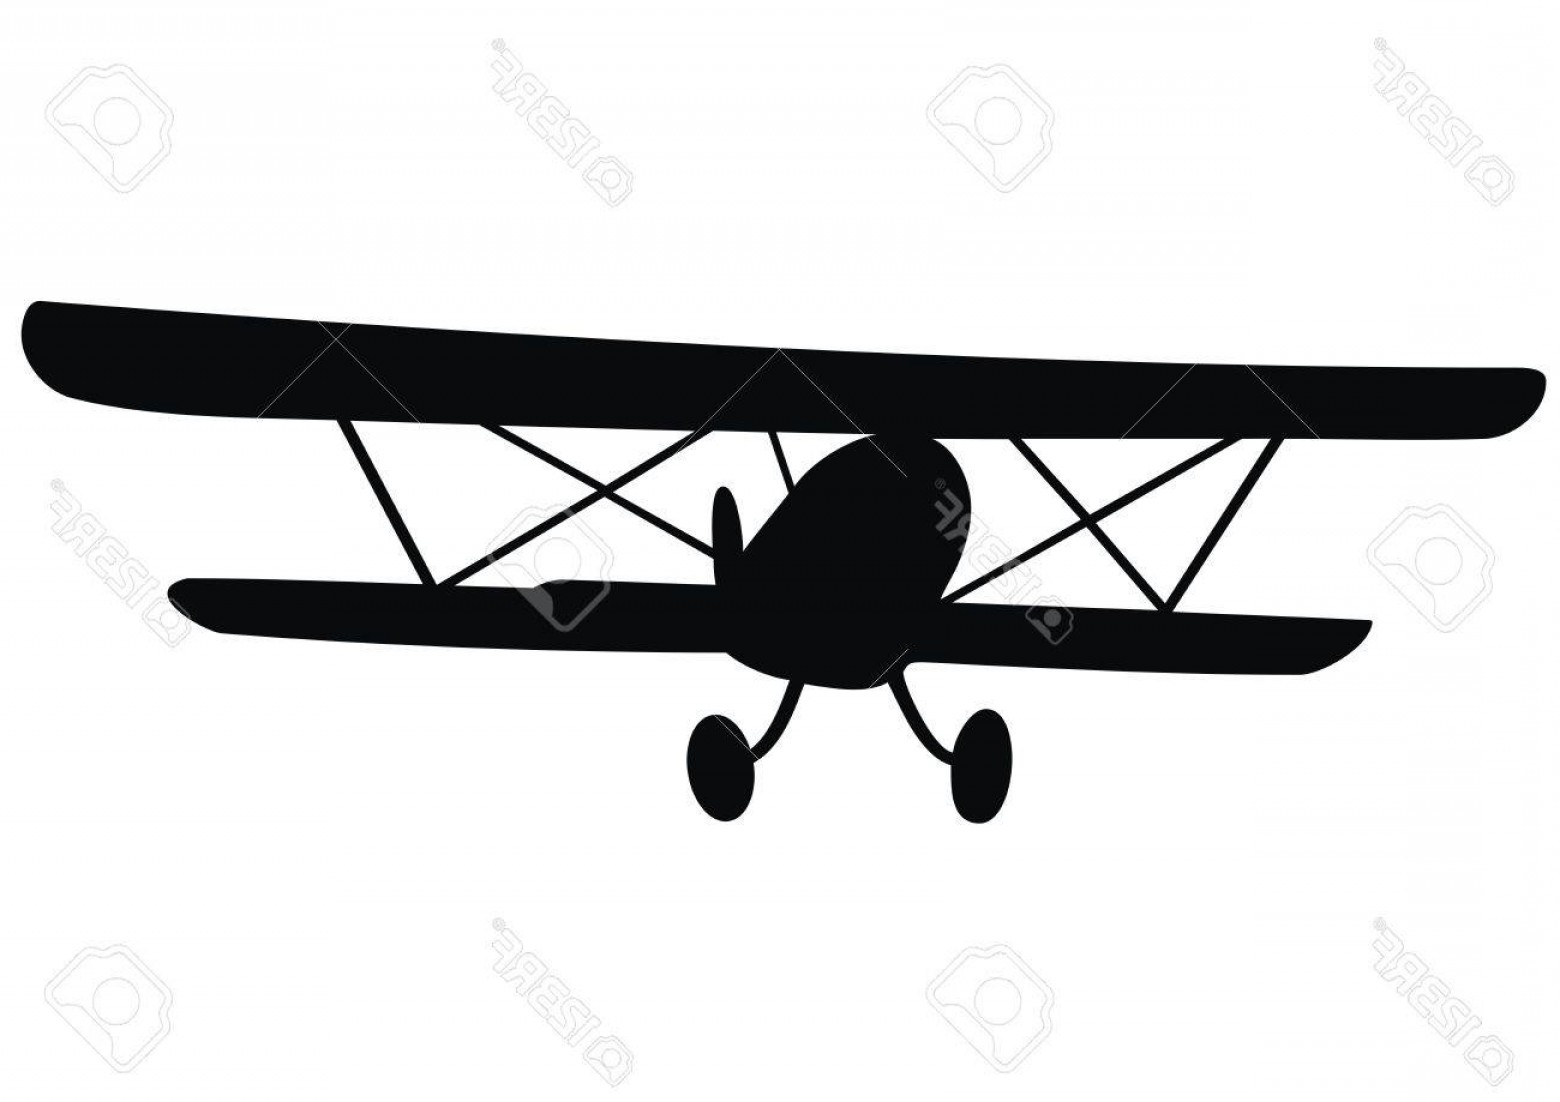 1560x1102 Bi Plane Vector Art Lazttweet